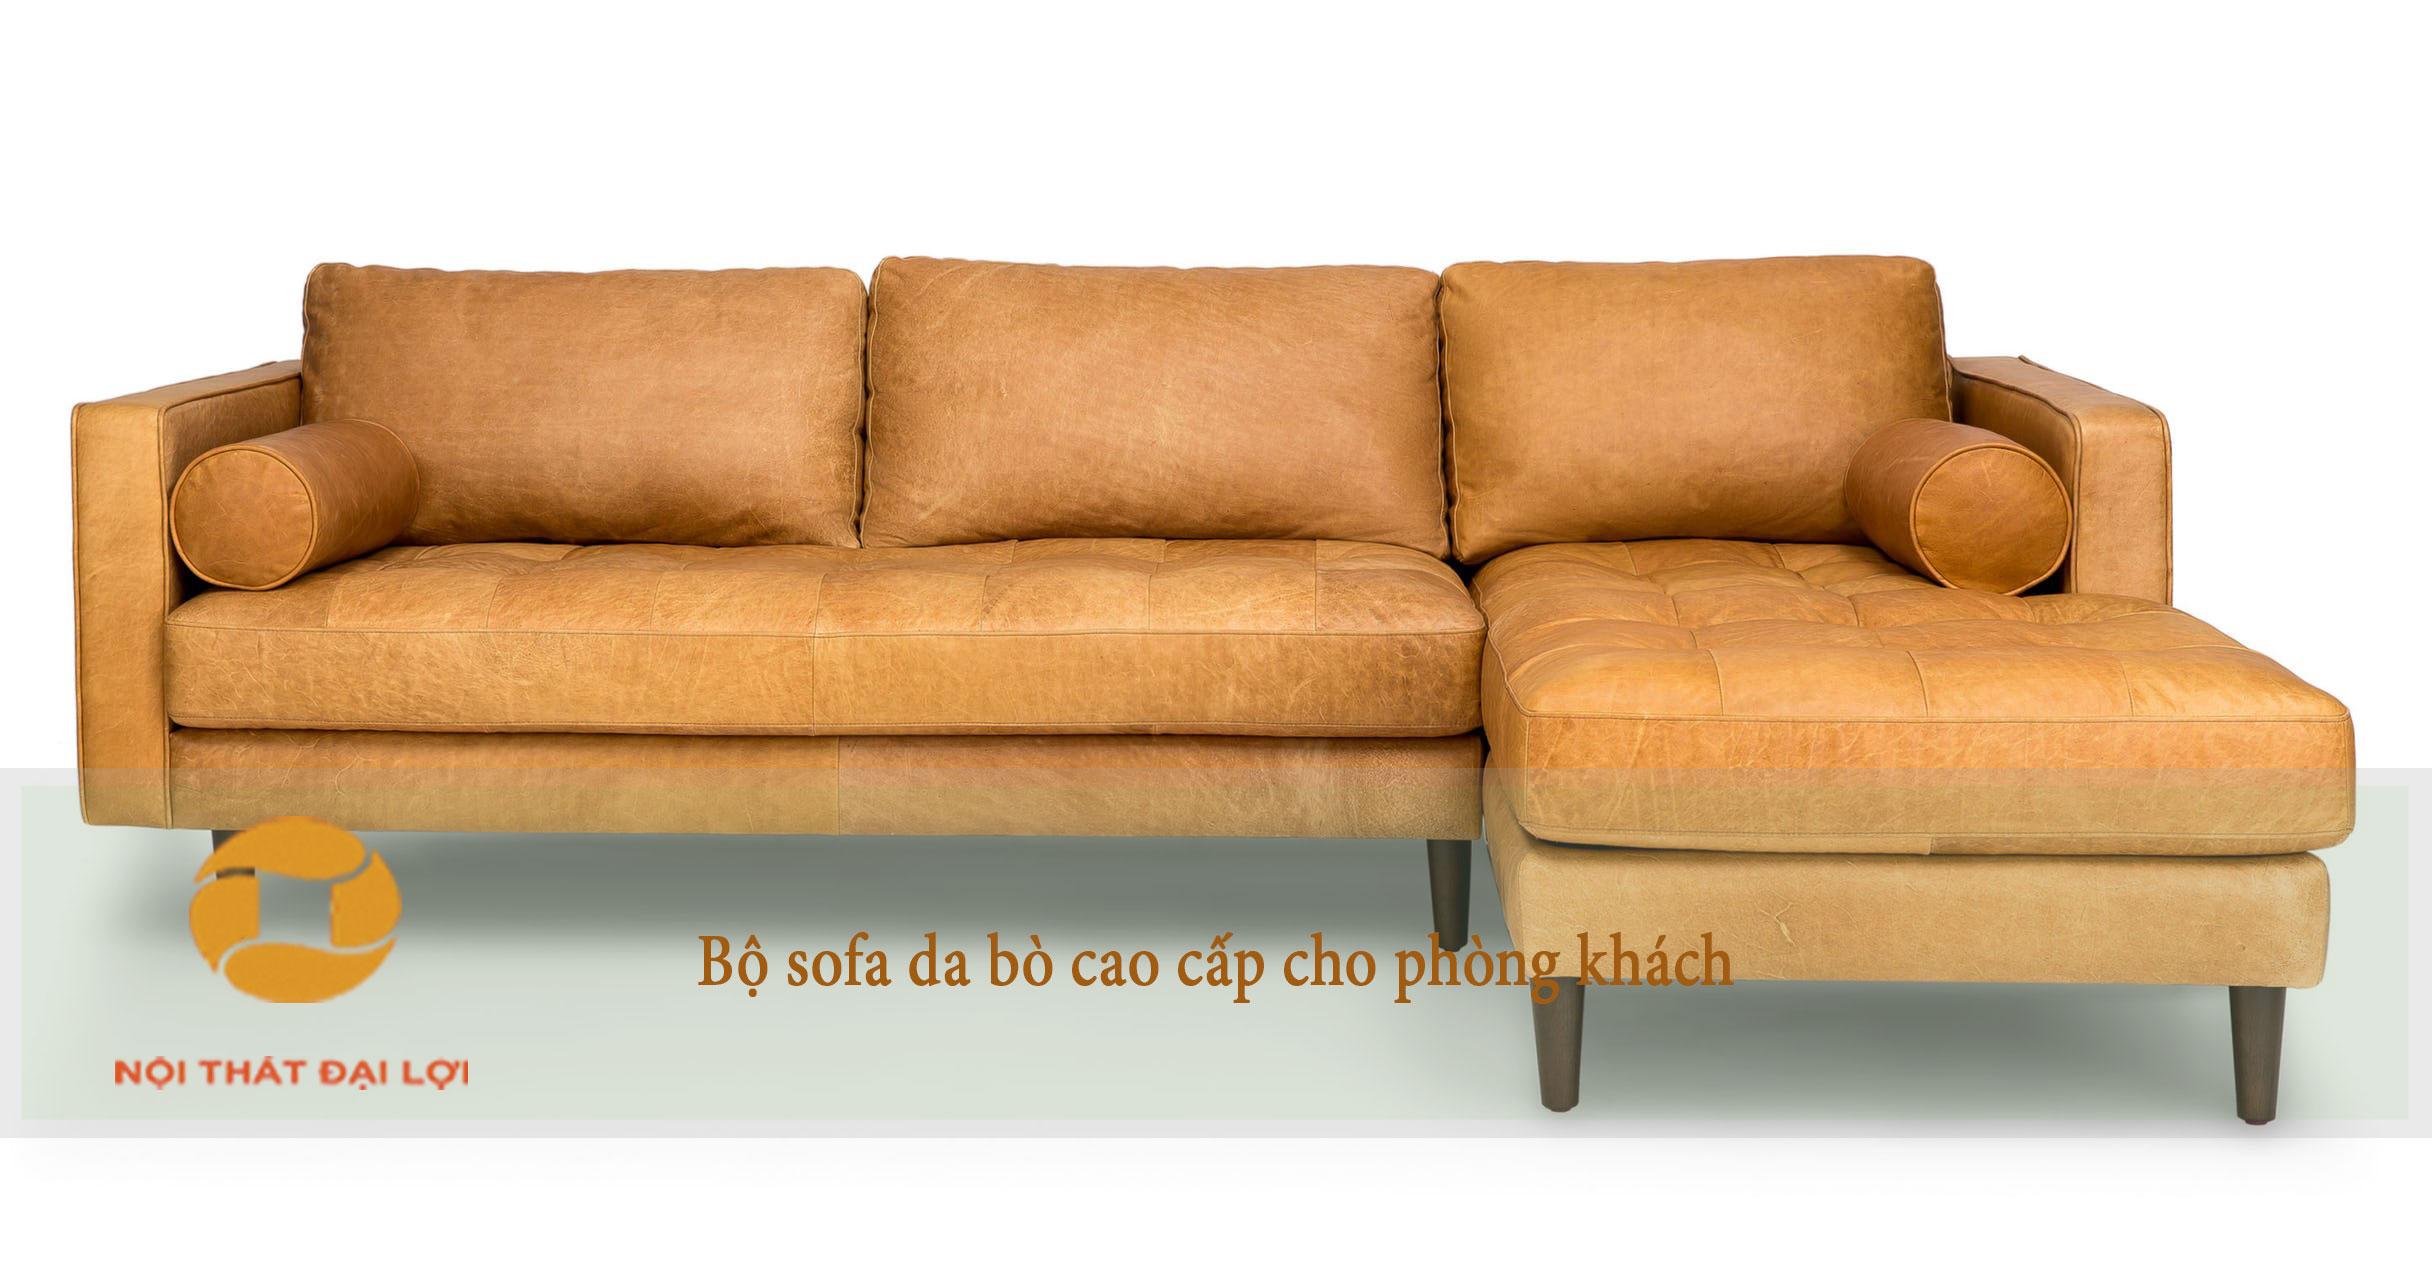 Top 100 mẫu sofa da bò tuyệt đẹp